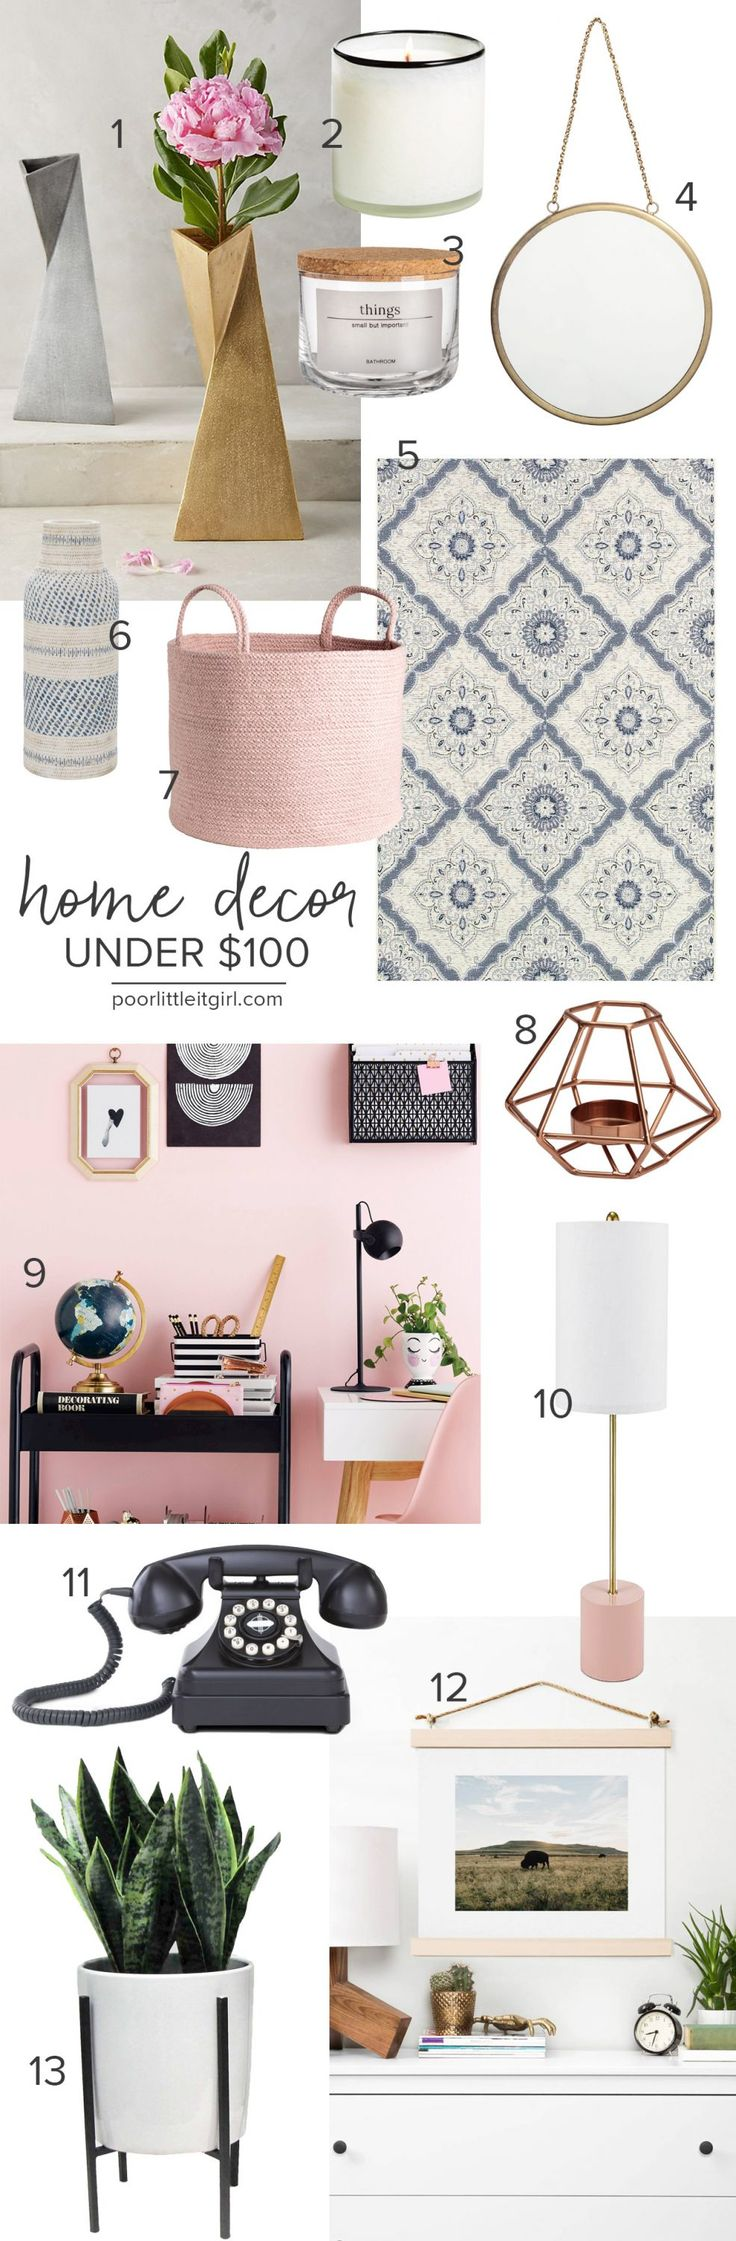 Easy Home Decor Updates Under $100 - Poor Little It Girl